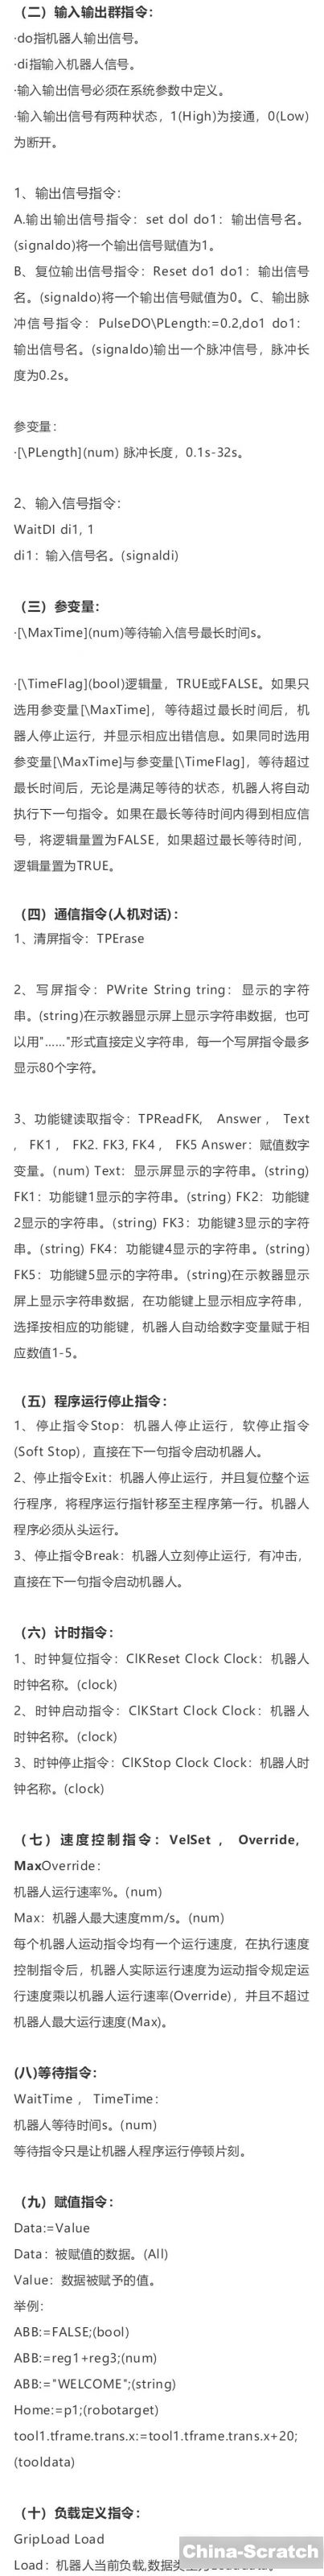 https://cdn.china-scratch.com/timg/200107/1114593333-2.jpg